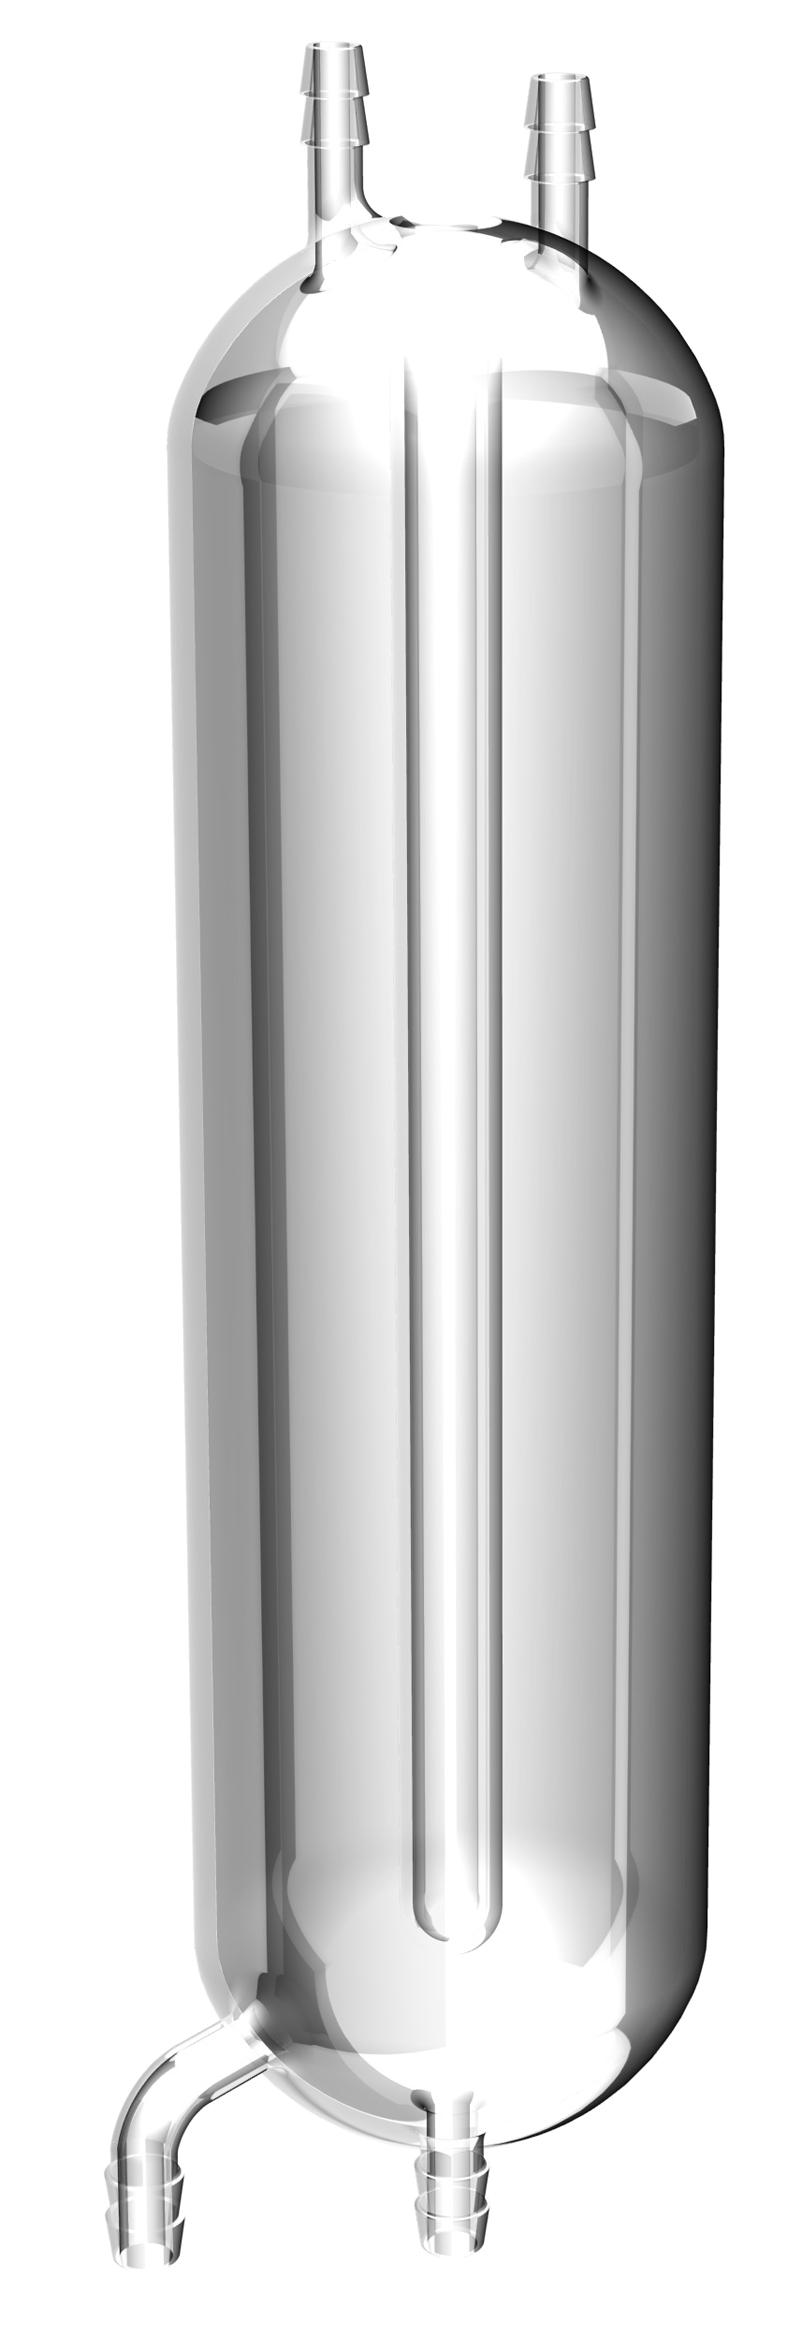 GF-1000-K-Imp_Vorlagegefäss